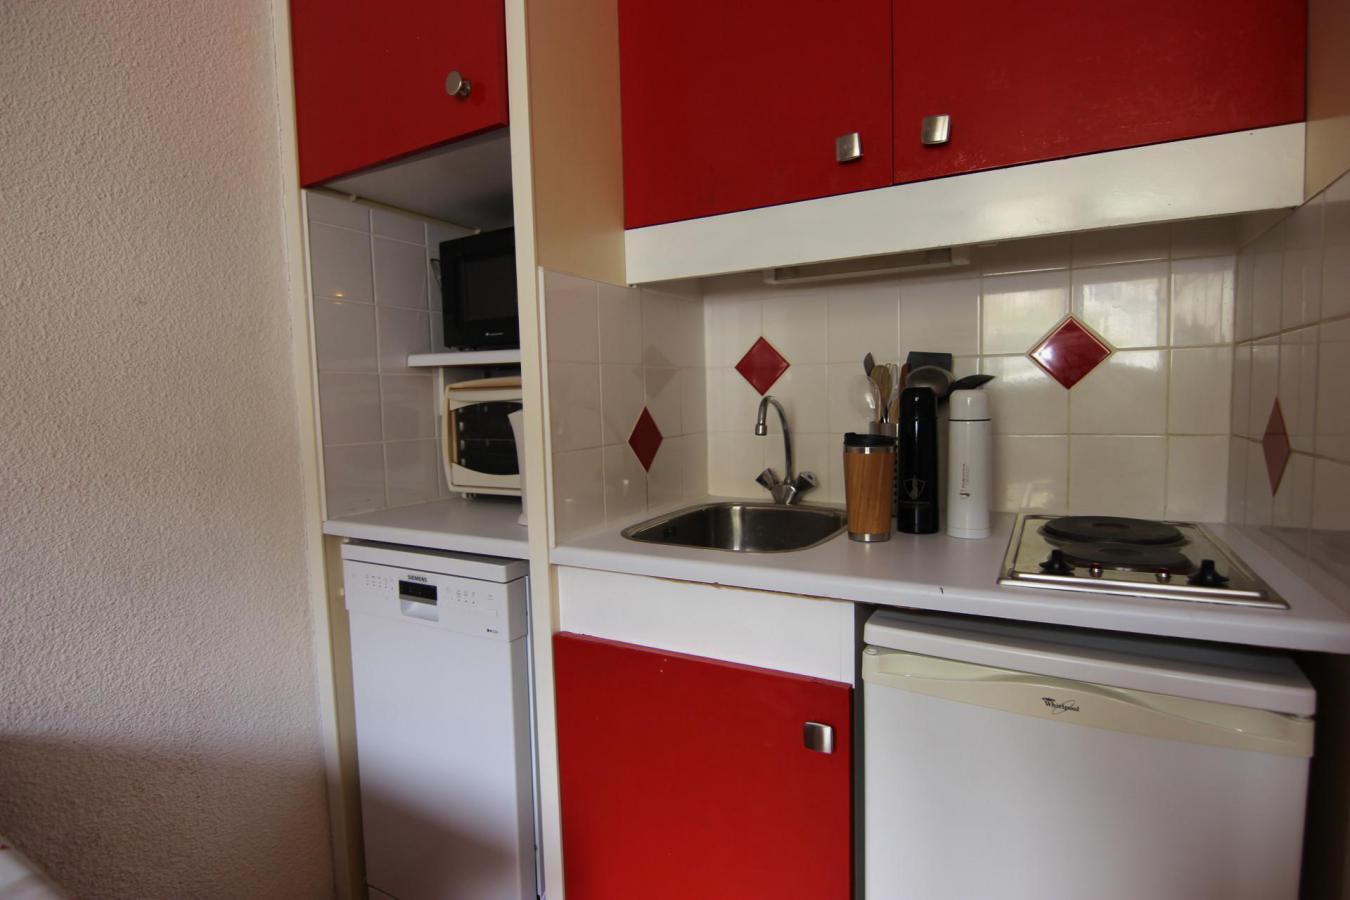 Location au ski Studio 2 personnes (125) - Residence Roche Blanche - Val Thorens - Kitchenette